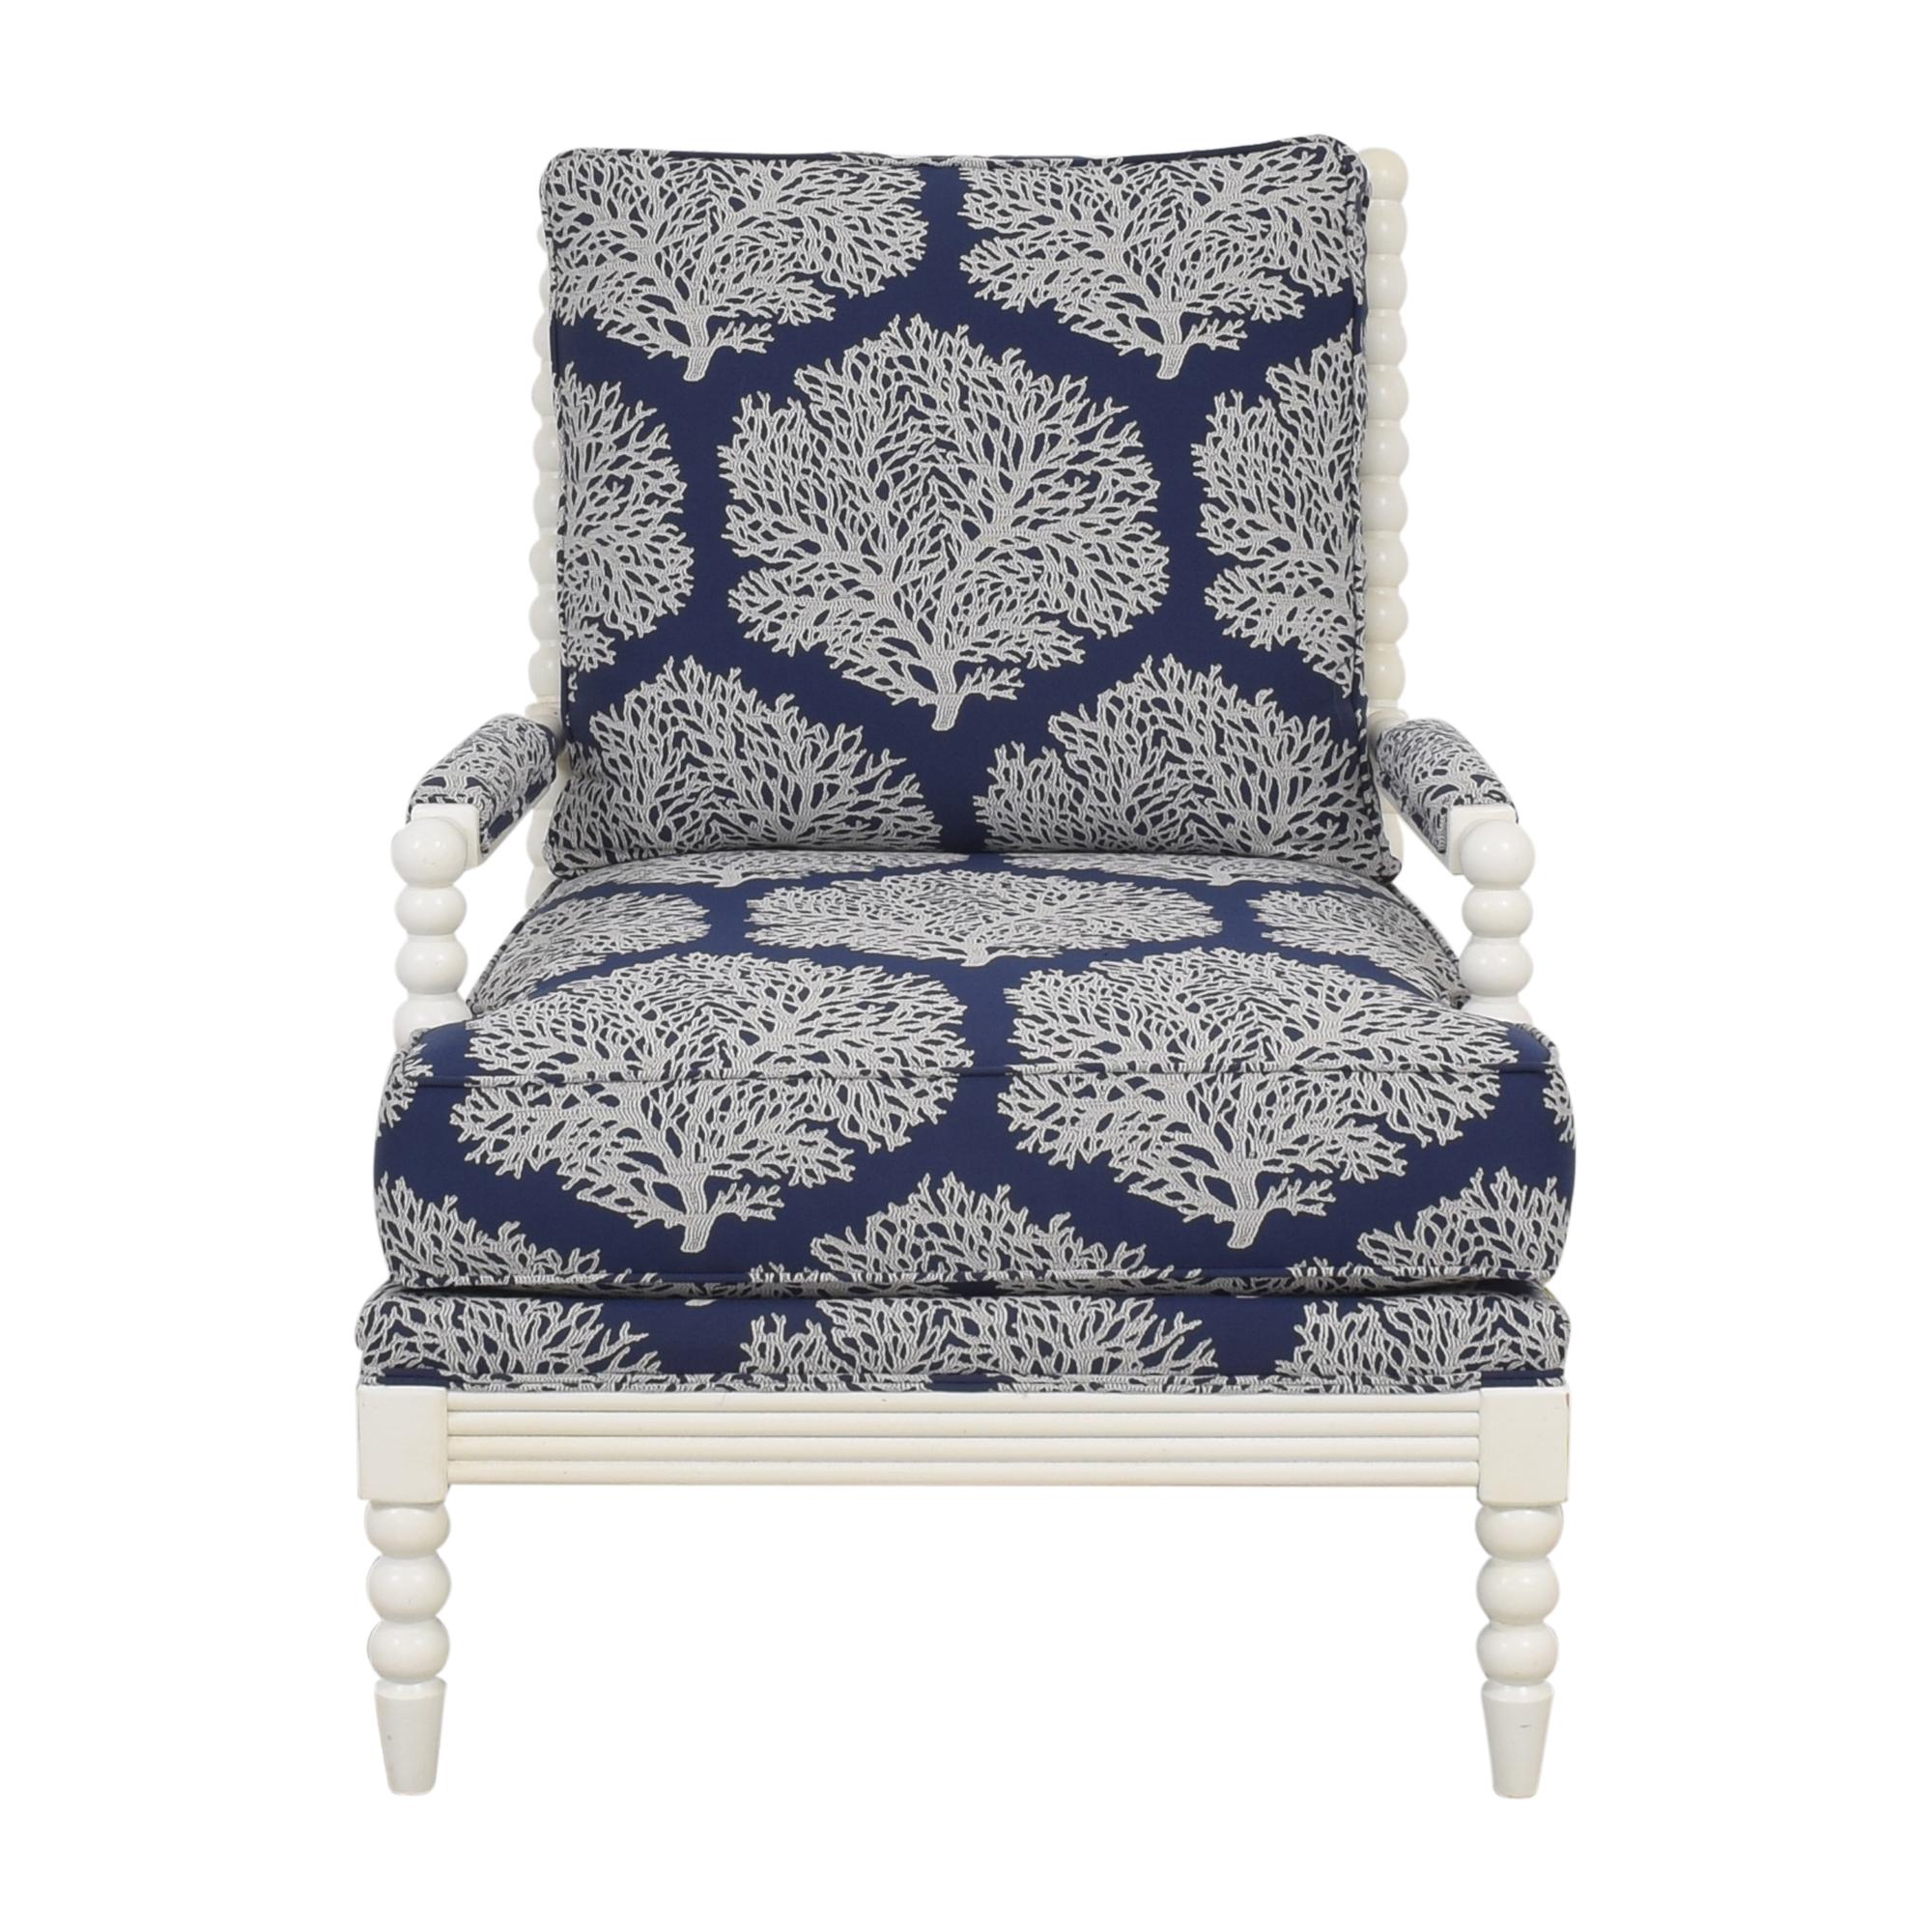 Ethan Allen Ethan Allen Custom Brandt Chair blue and white